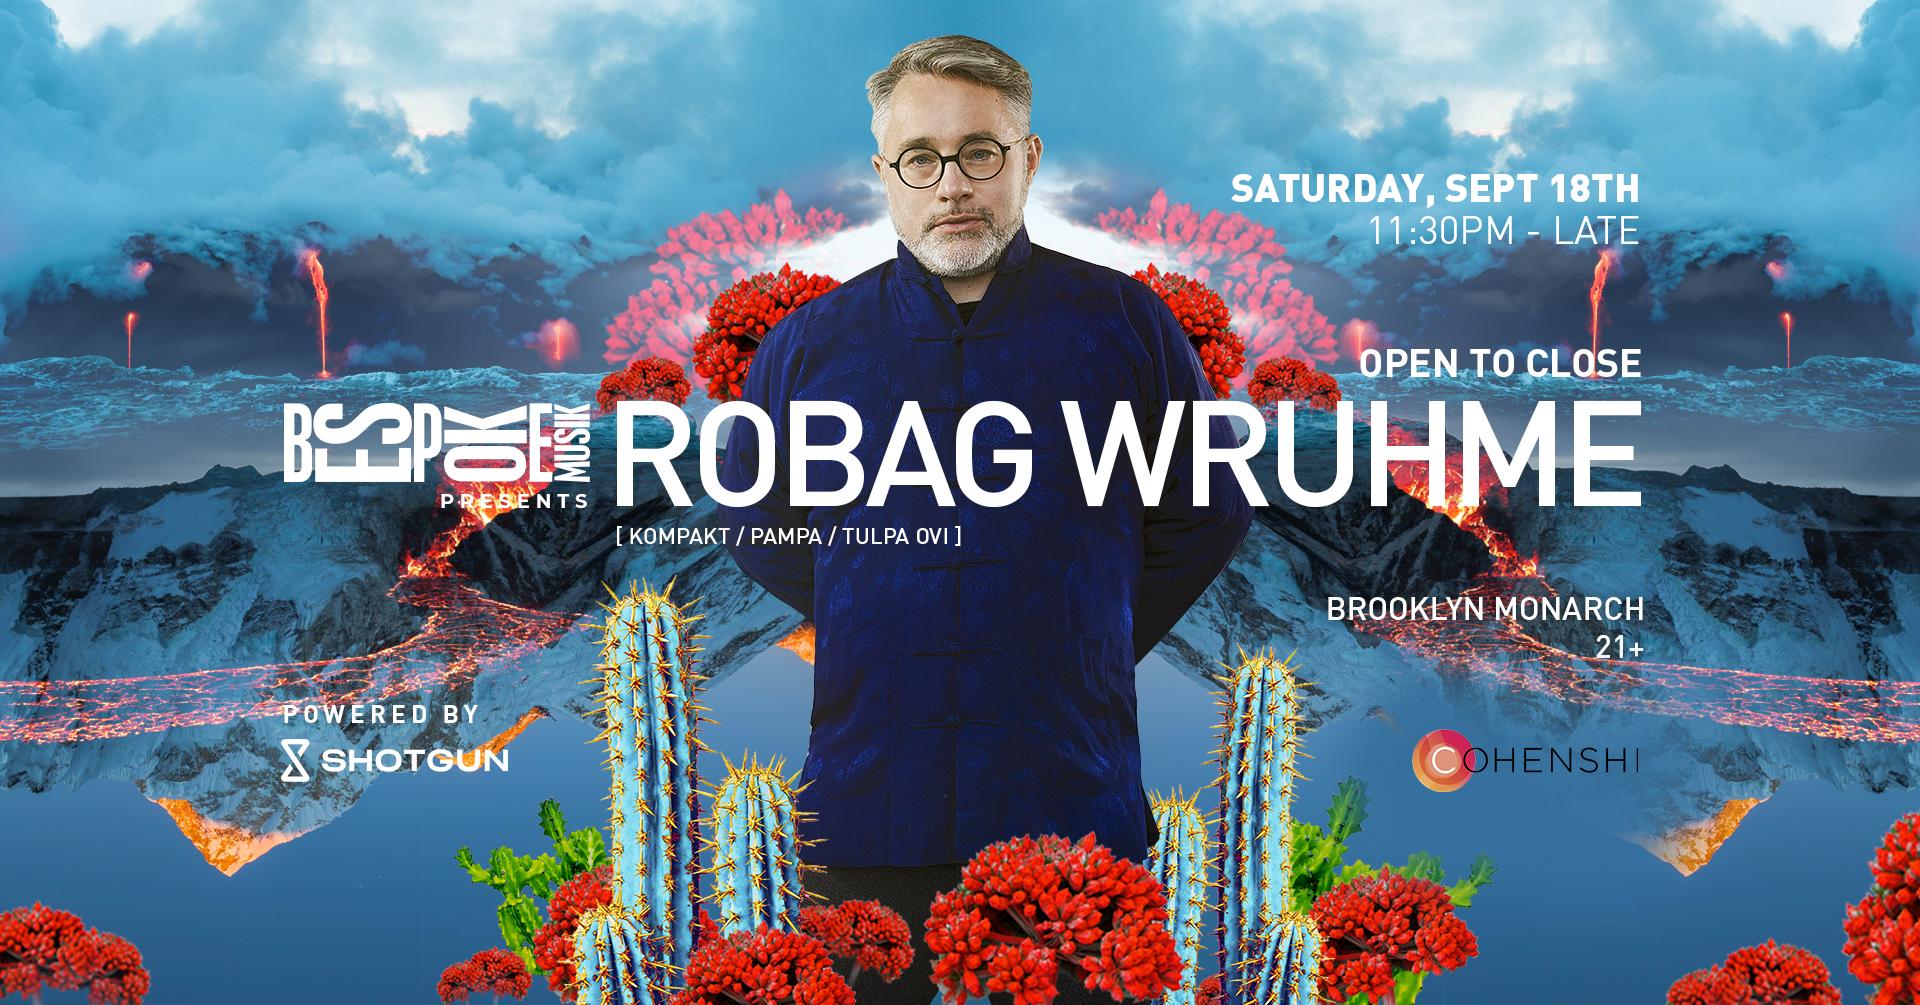 Bespoke Musik Presents Robag Wruhme (Open to Close)